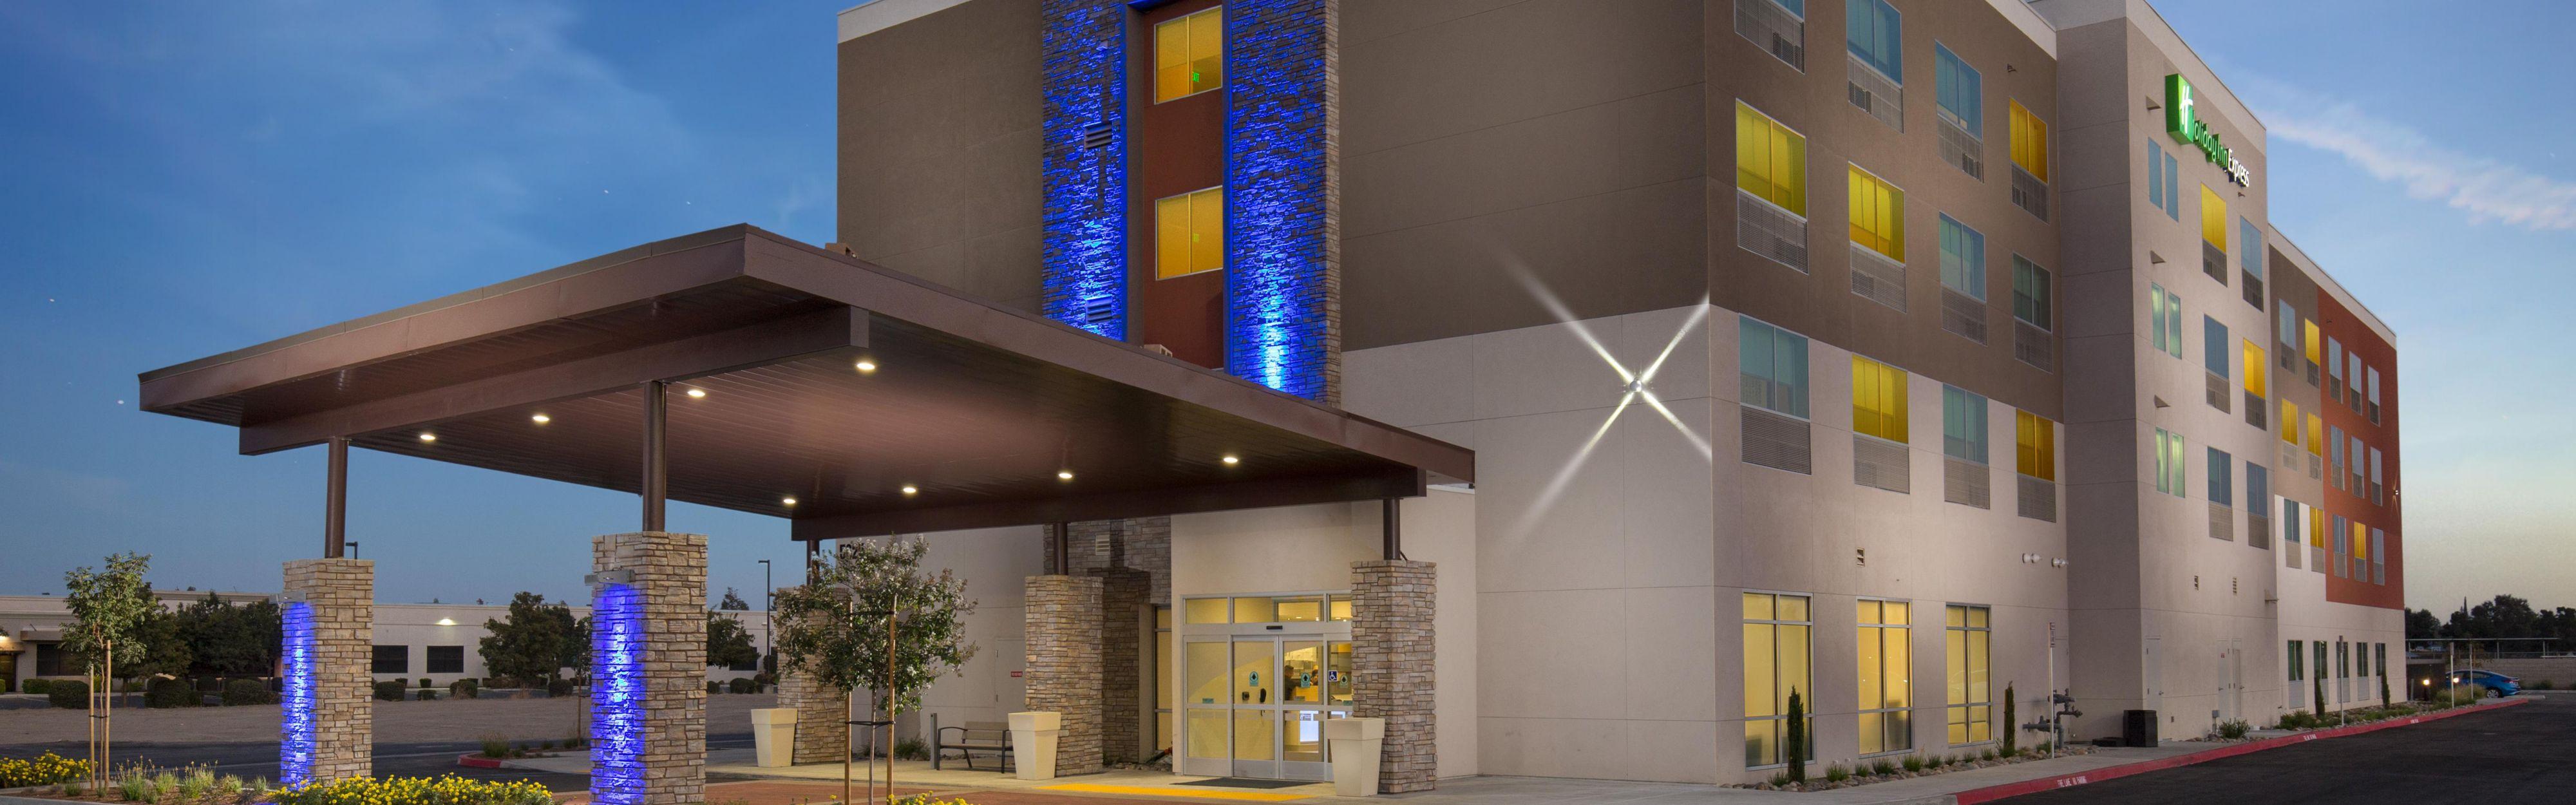 Holiday Inn Express Visalia image 0